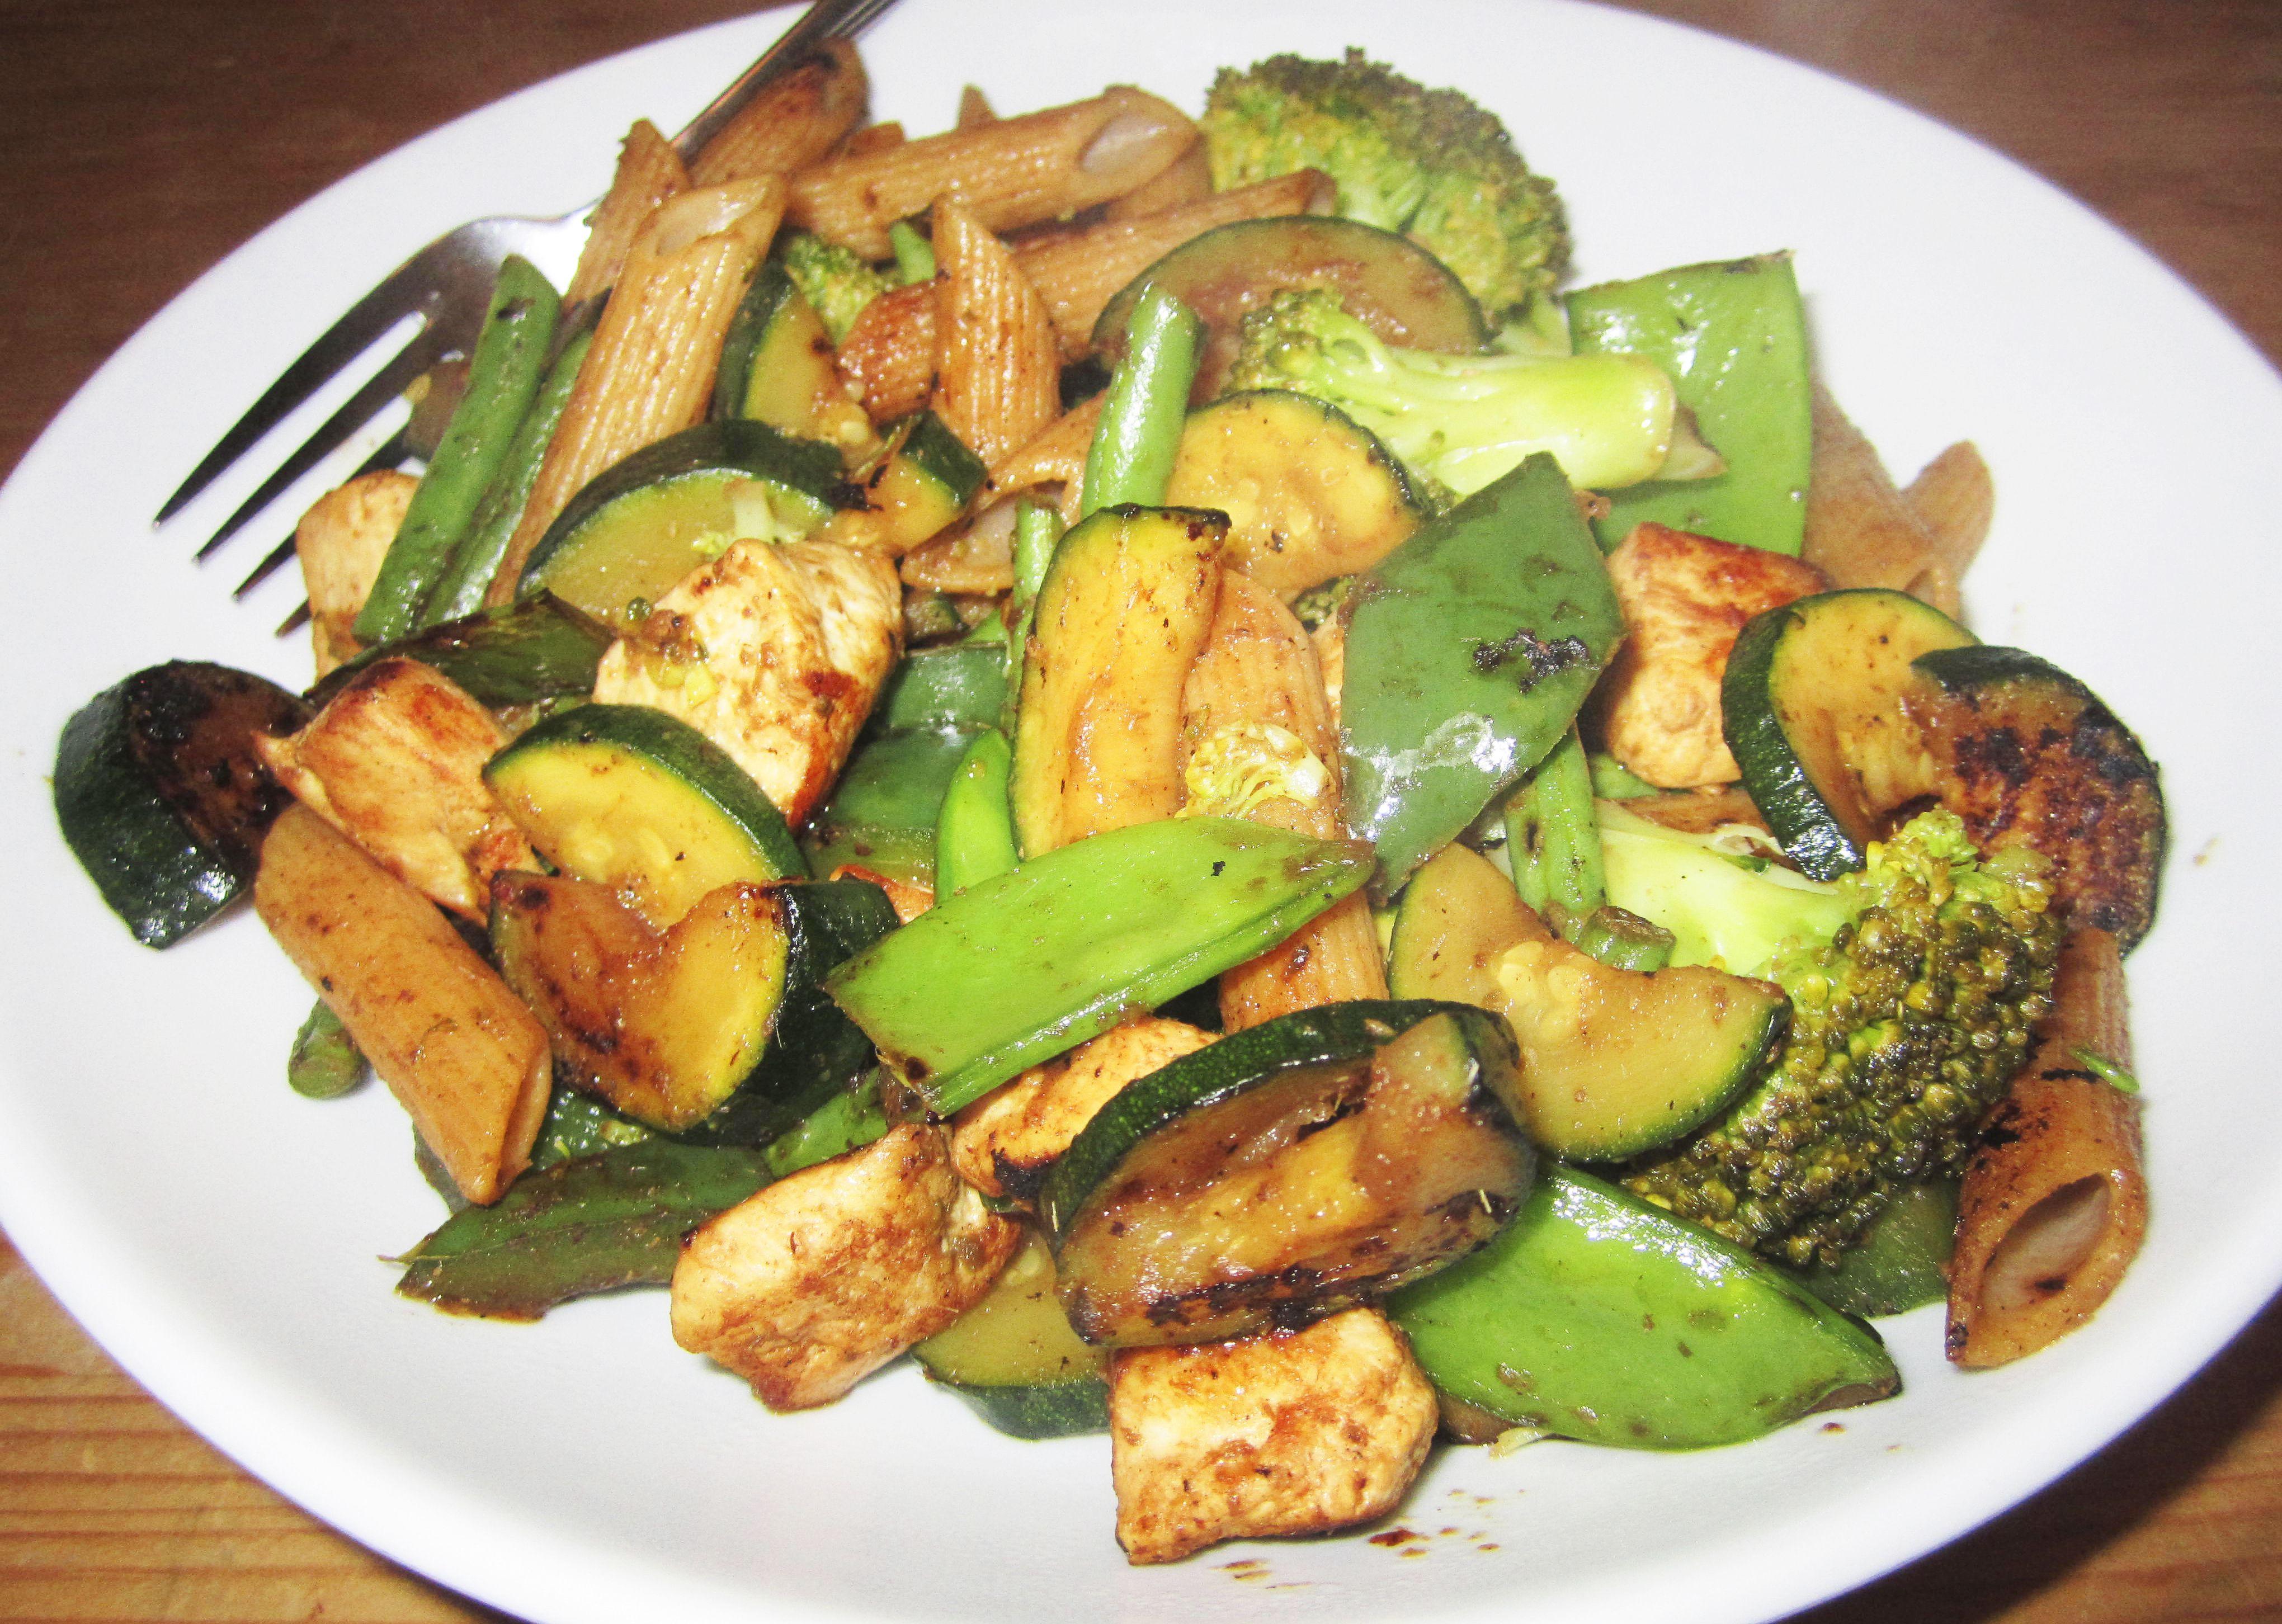 Healthy Quick Dinner  Quick chicken dinner recipes healthy Food chicken recipes